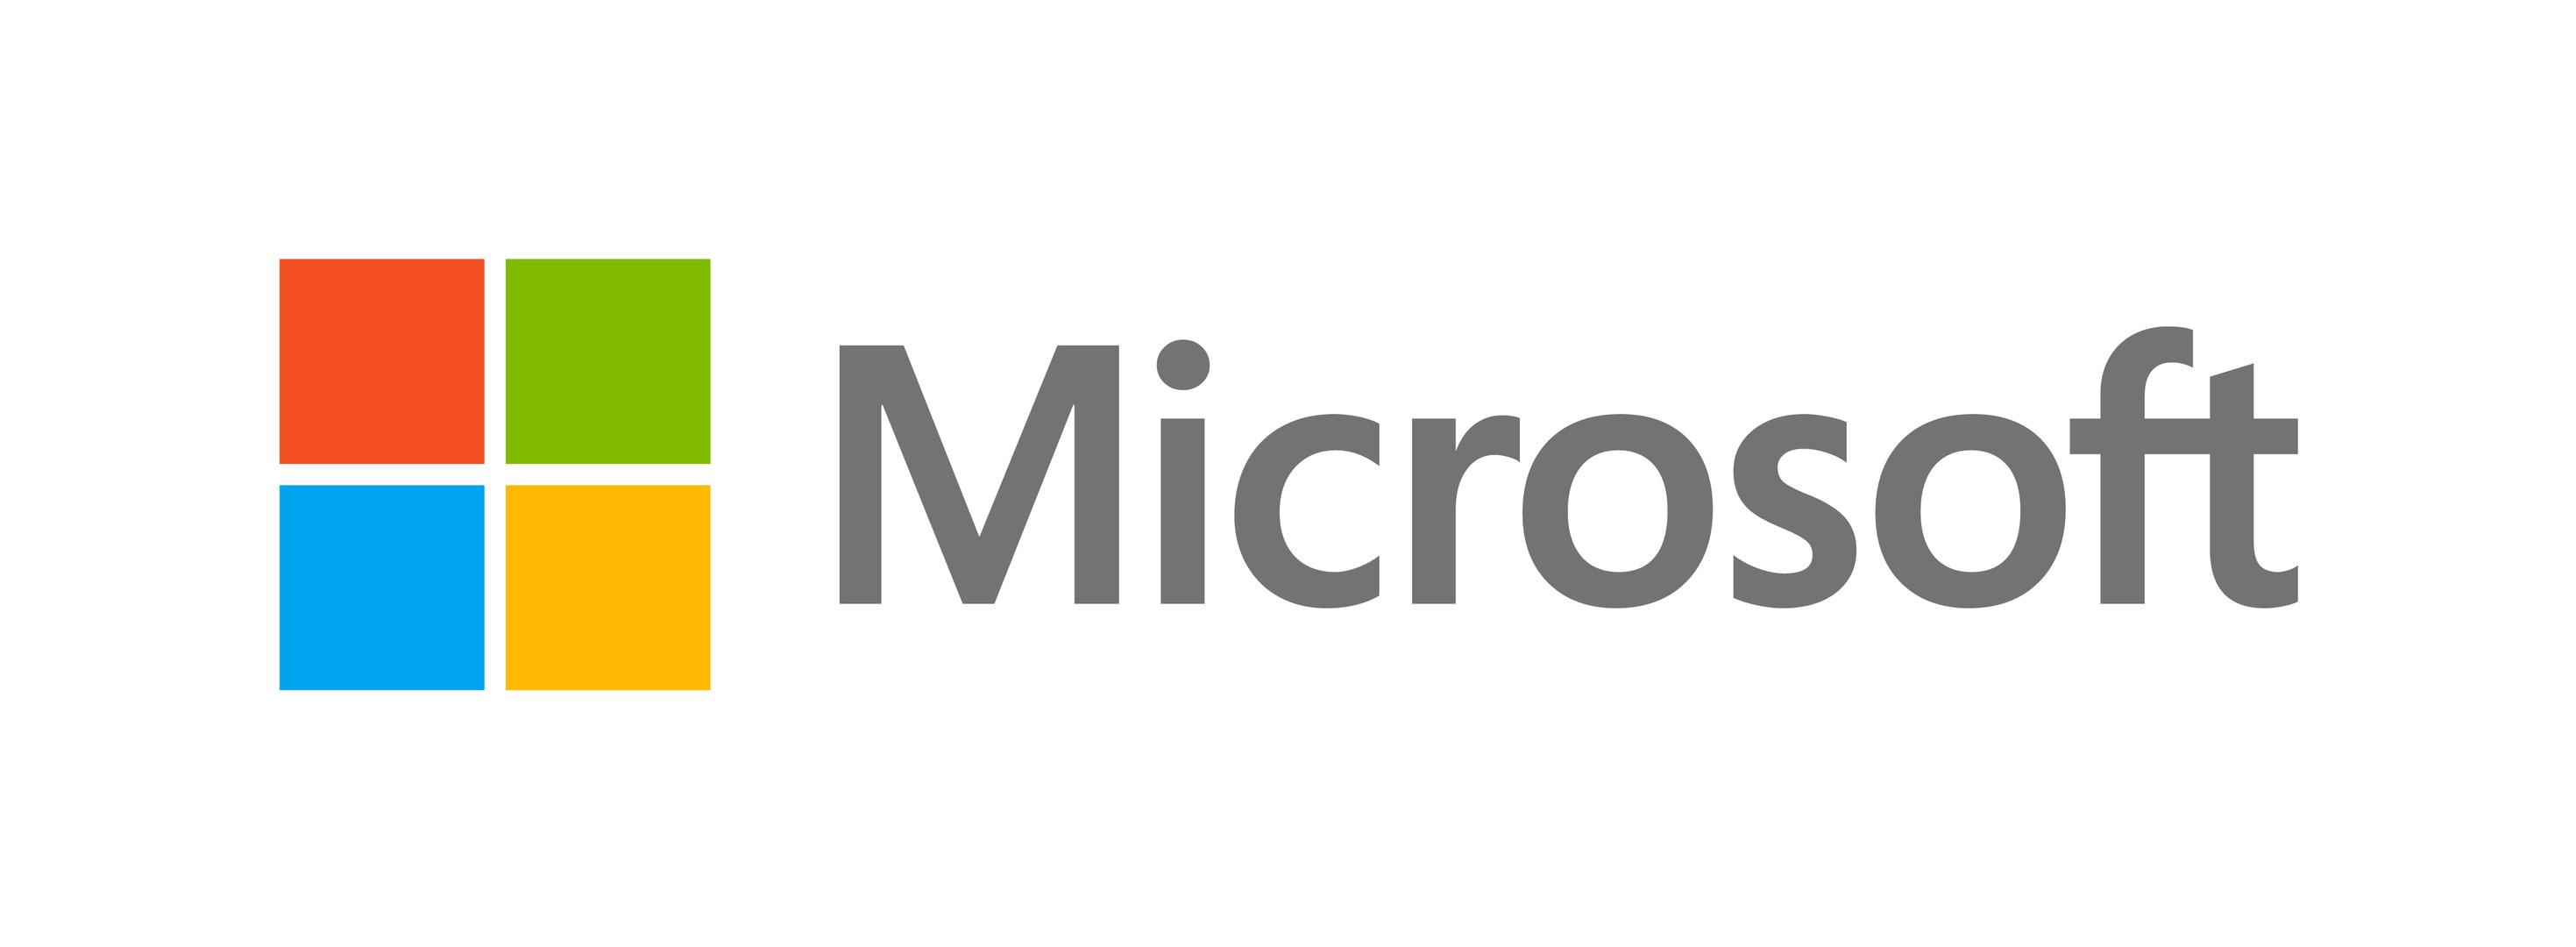 8867.Microsoft_5F00_Logo_2D00_for_2D00_s